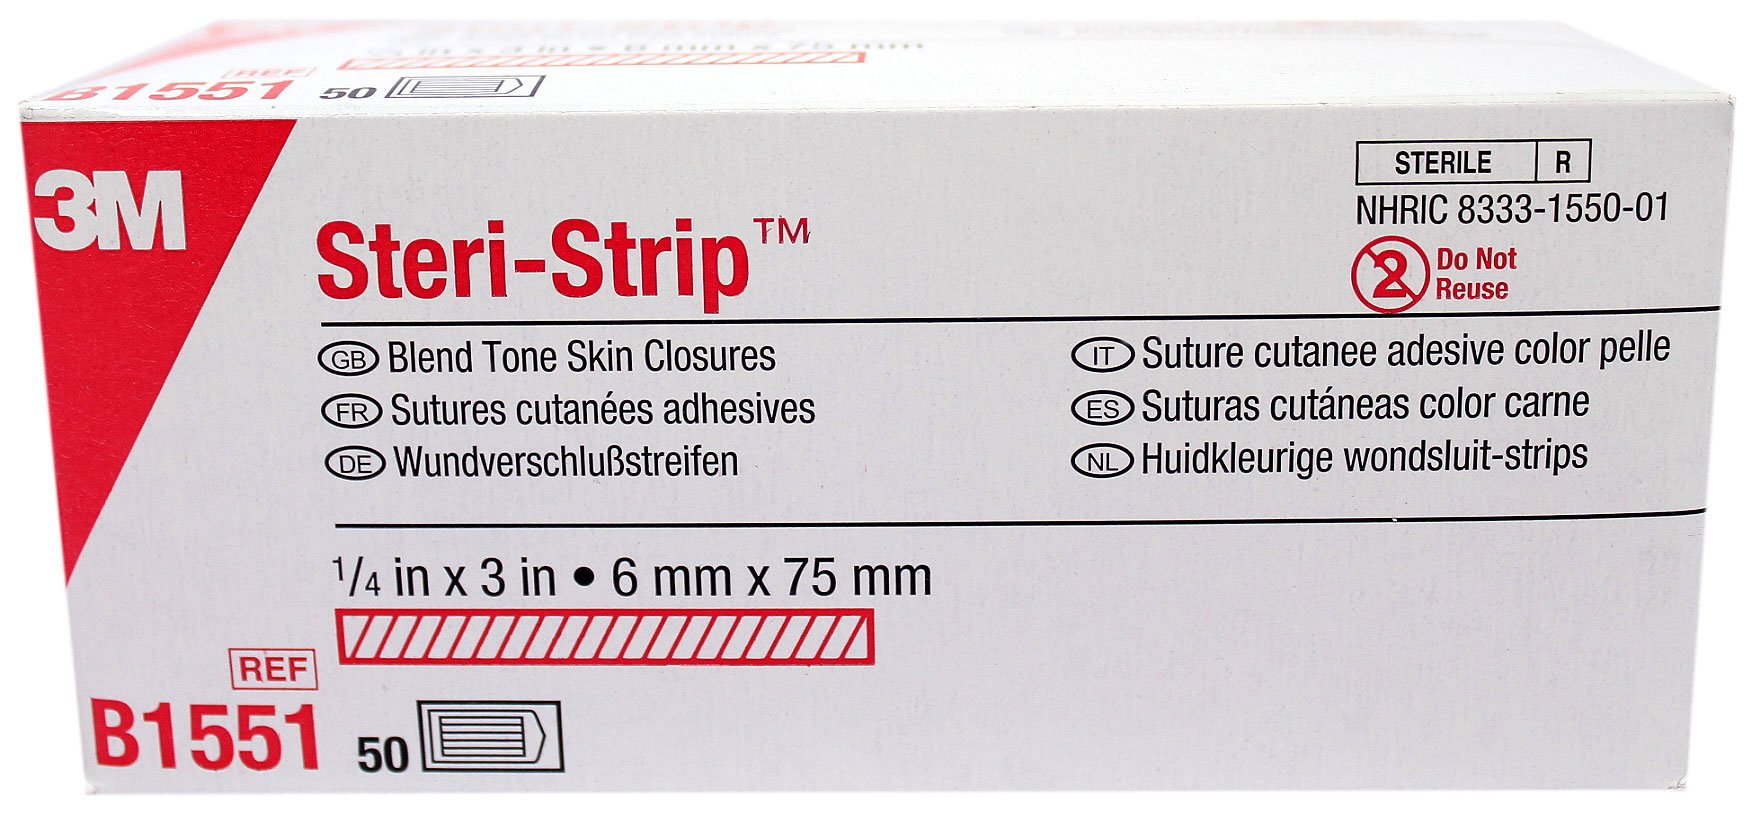 3M B1551 Steri-Strip Wound Closure 1/4'' x 3'' TAN- 3 Strips per Pack - Box of 50 Packs